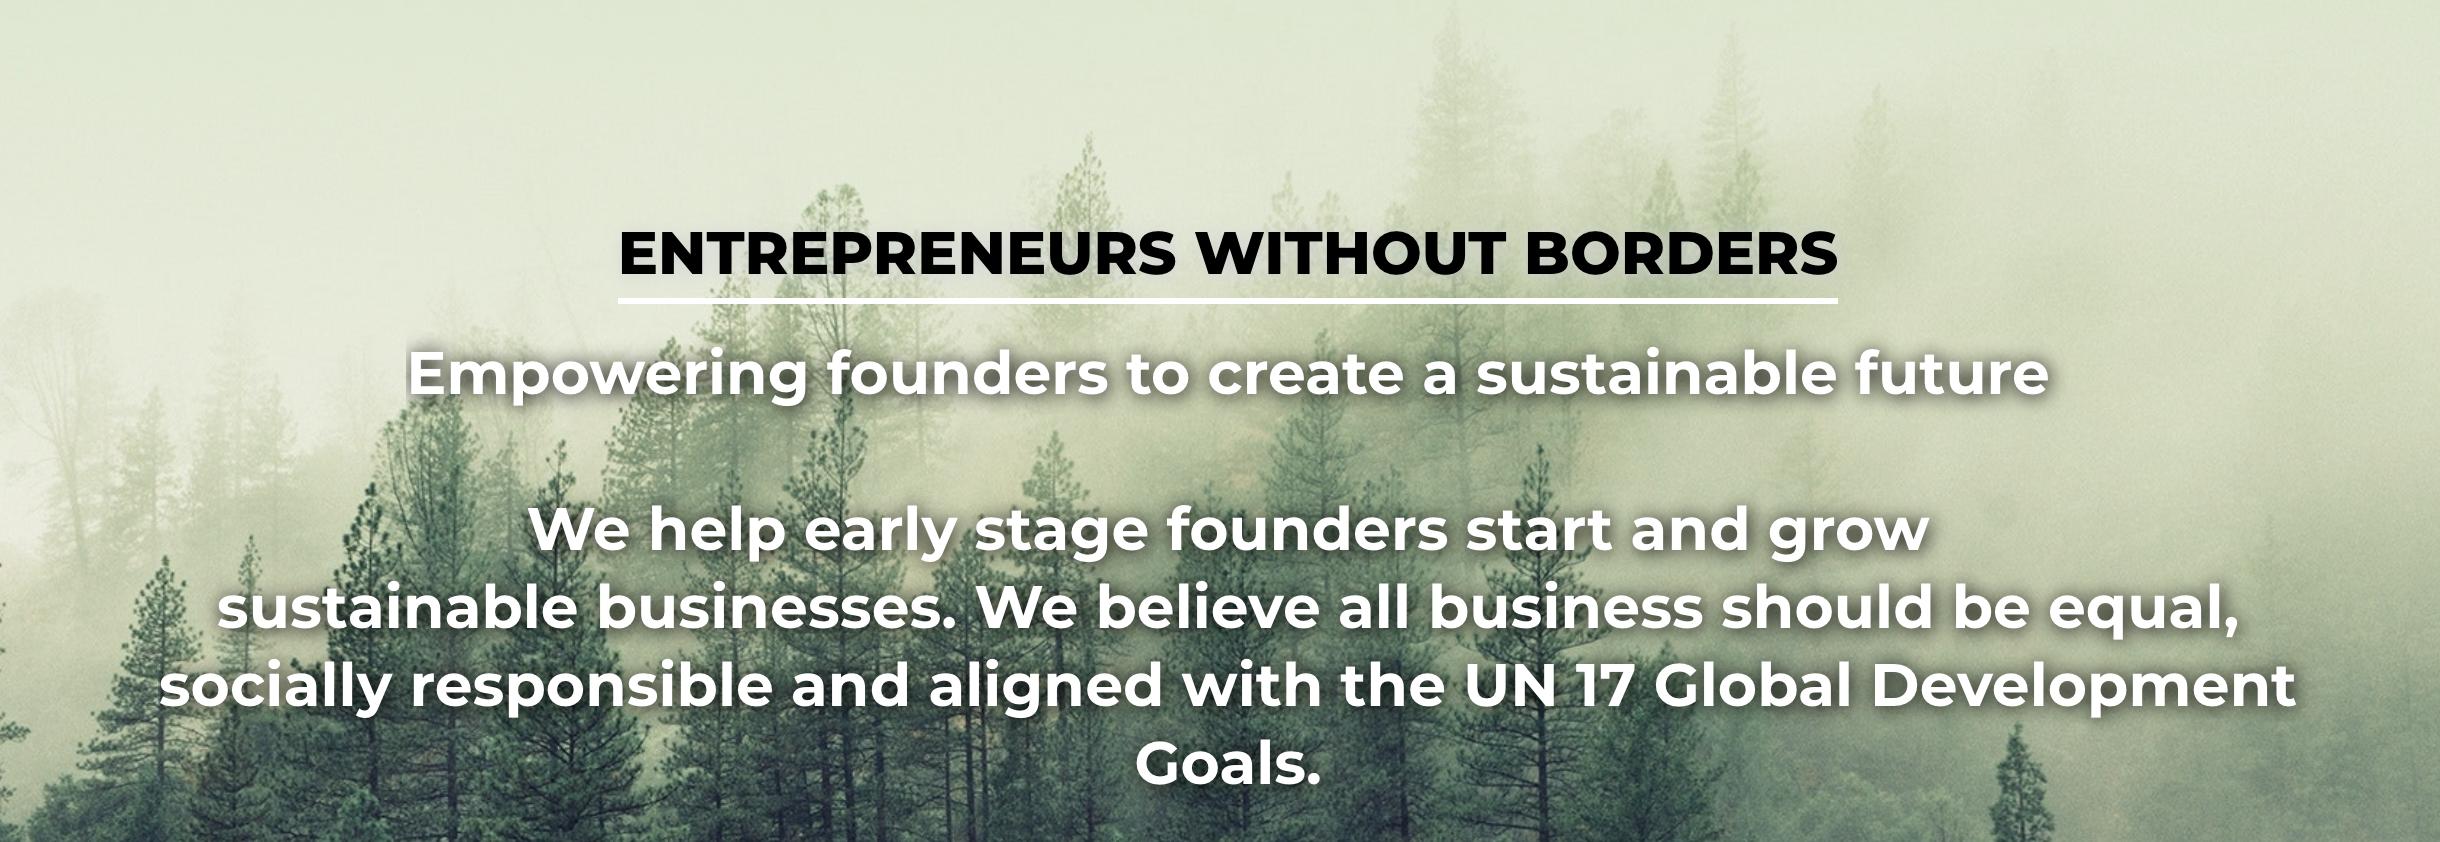 Entrepreneurs Without Borders